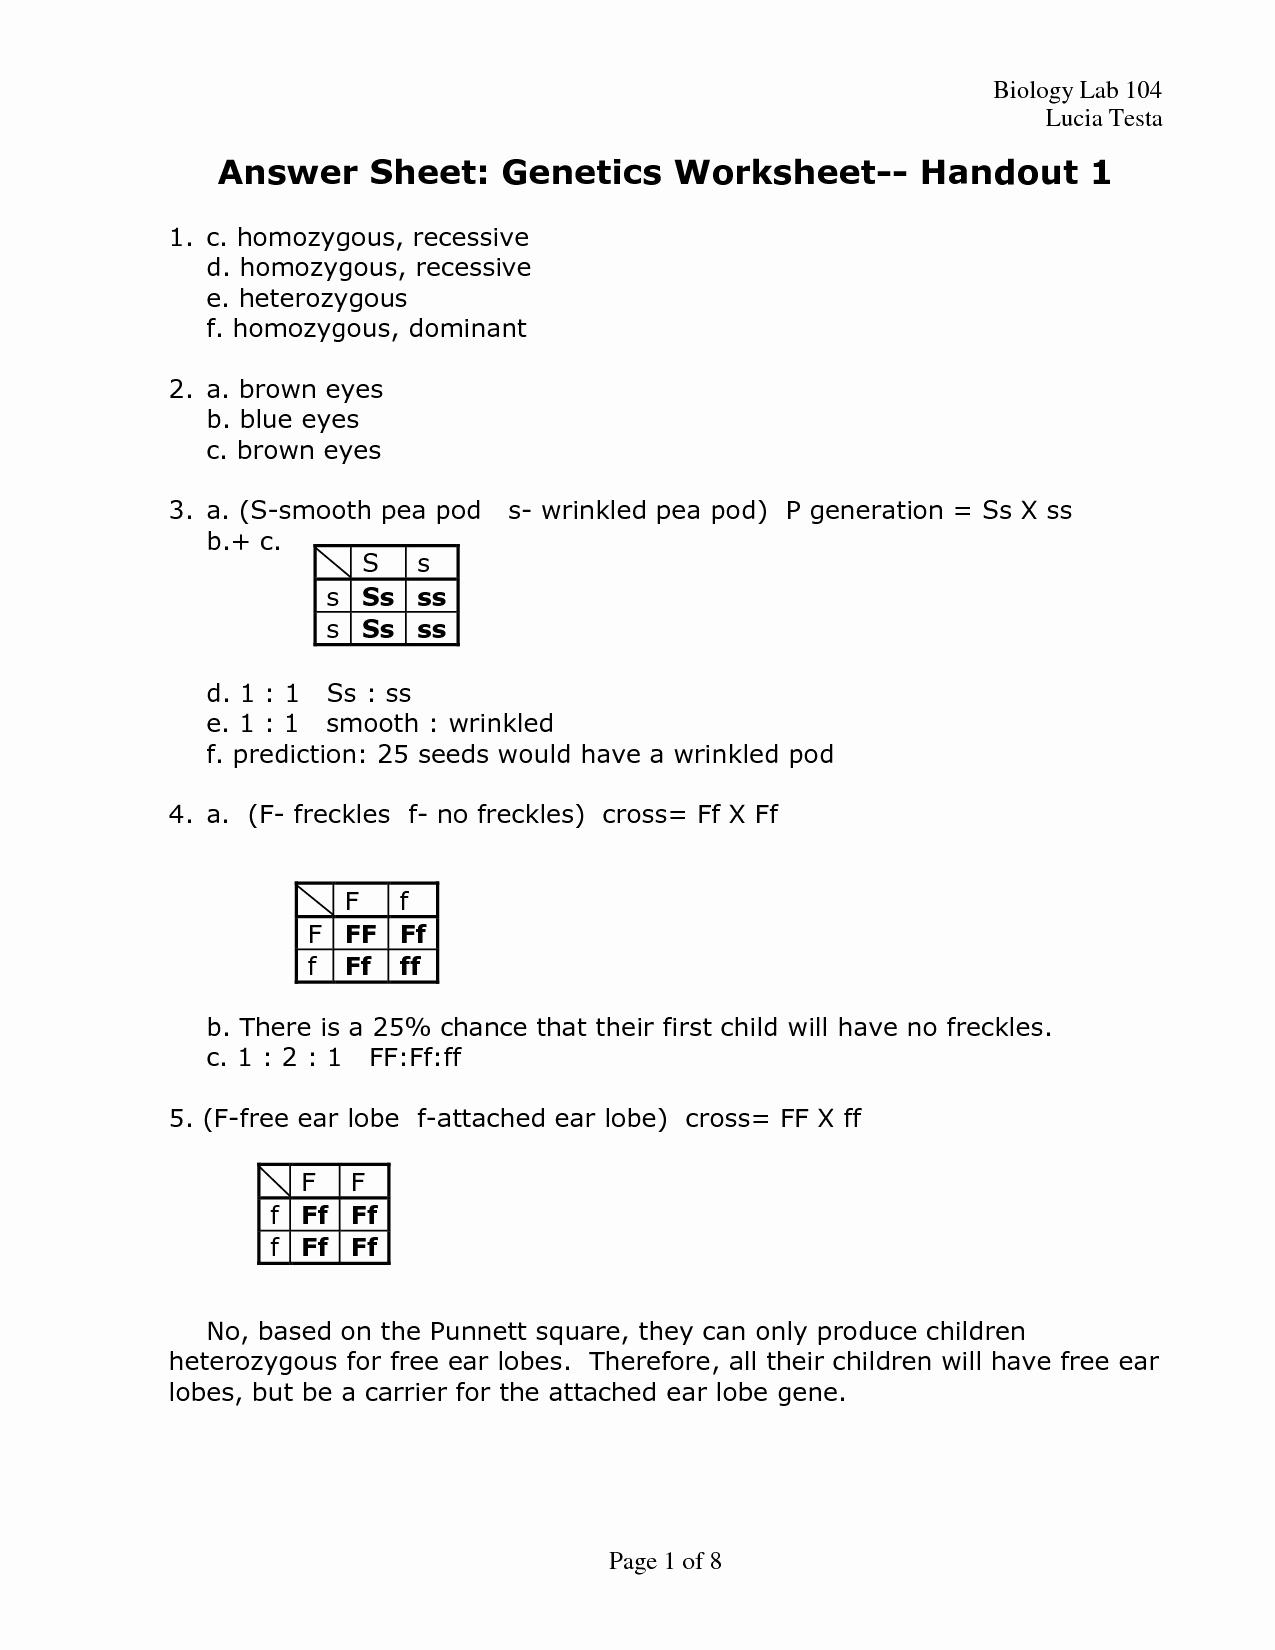 Genetics Problems Worksheet Answer Key Unique 19 Best Of the Genetic Code Worksheet Answers